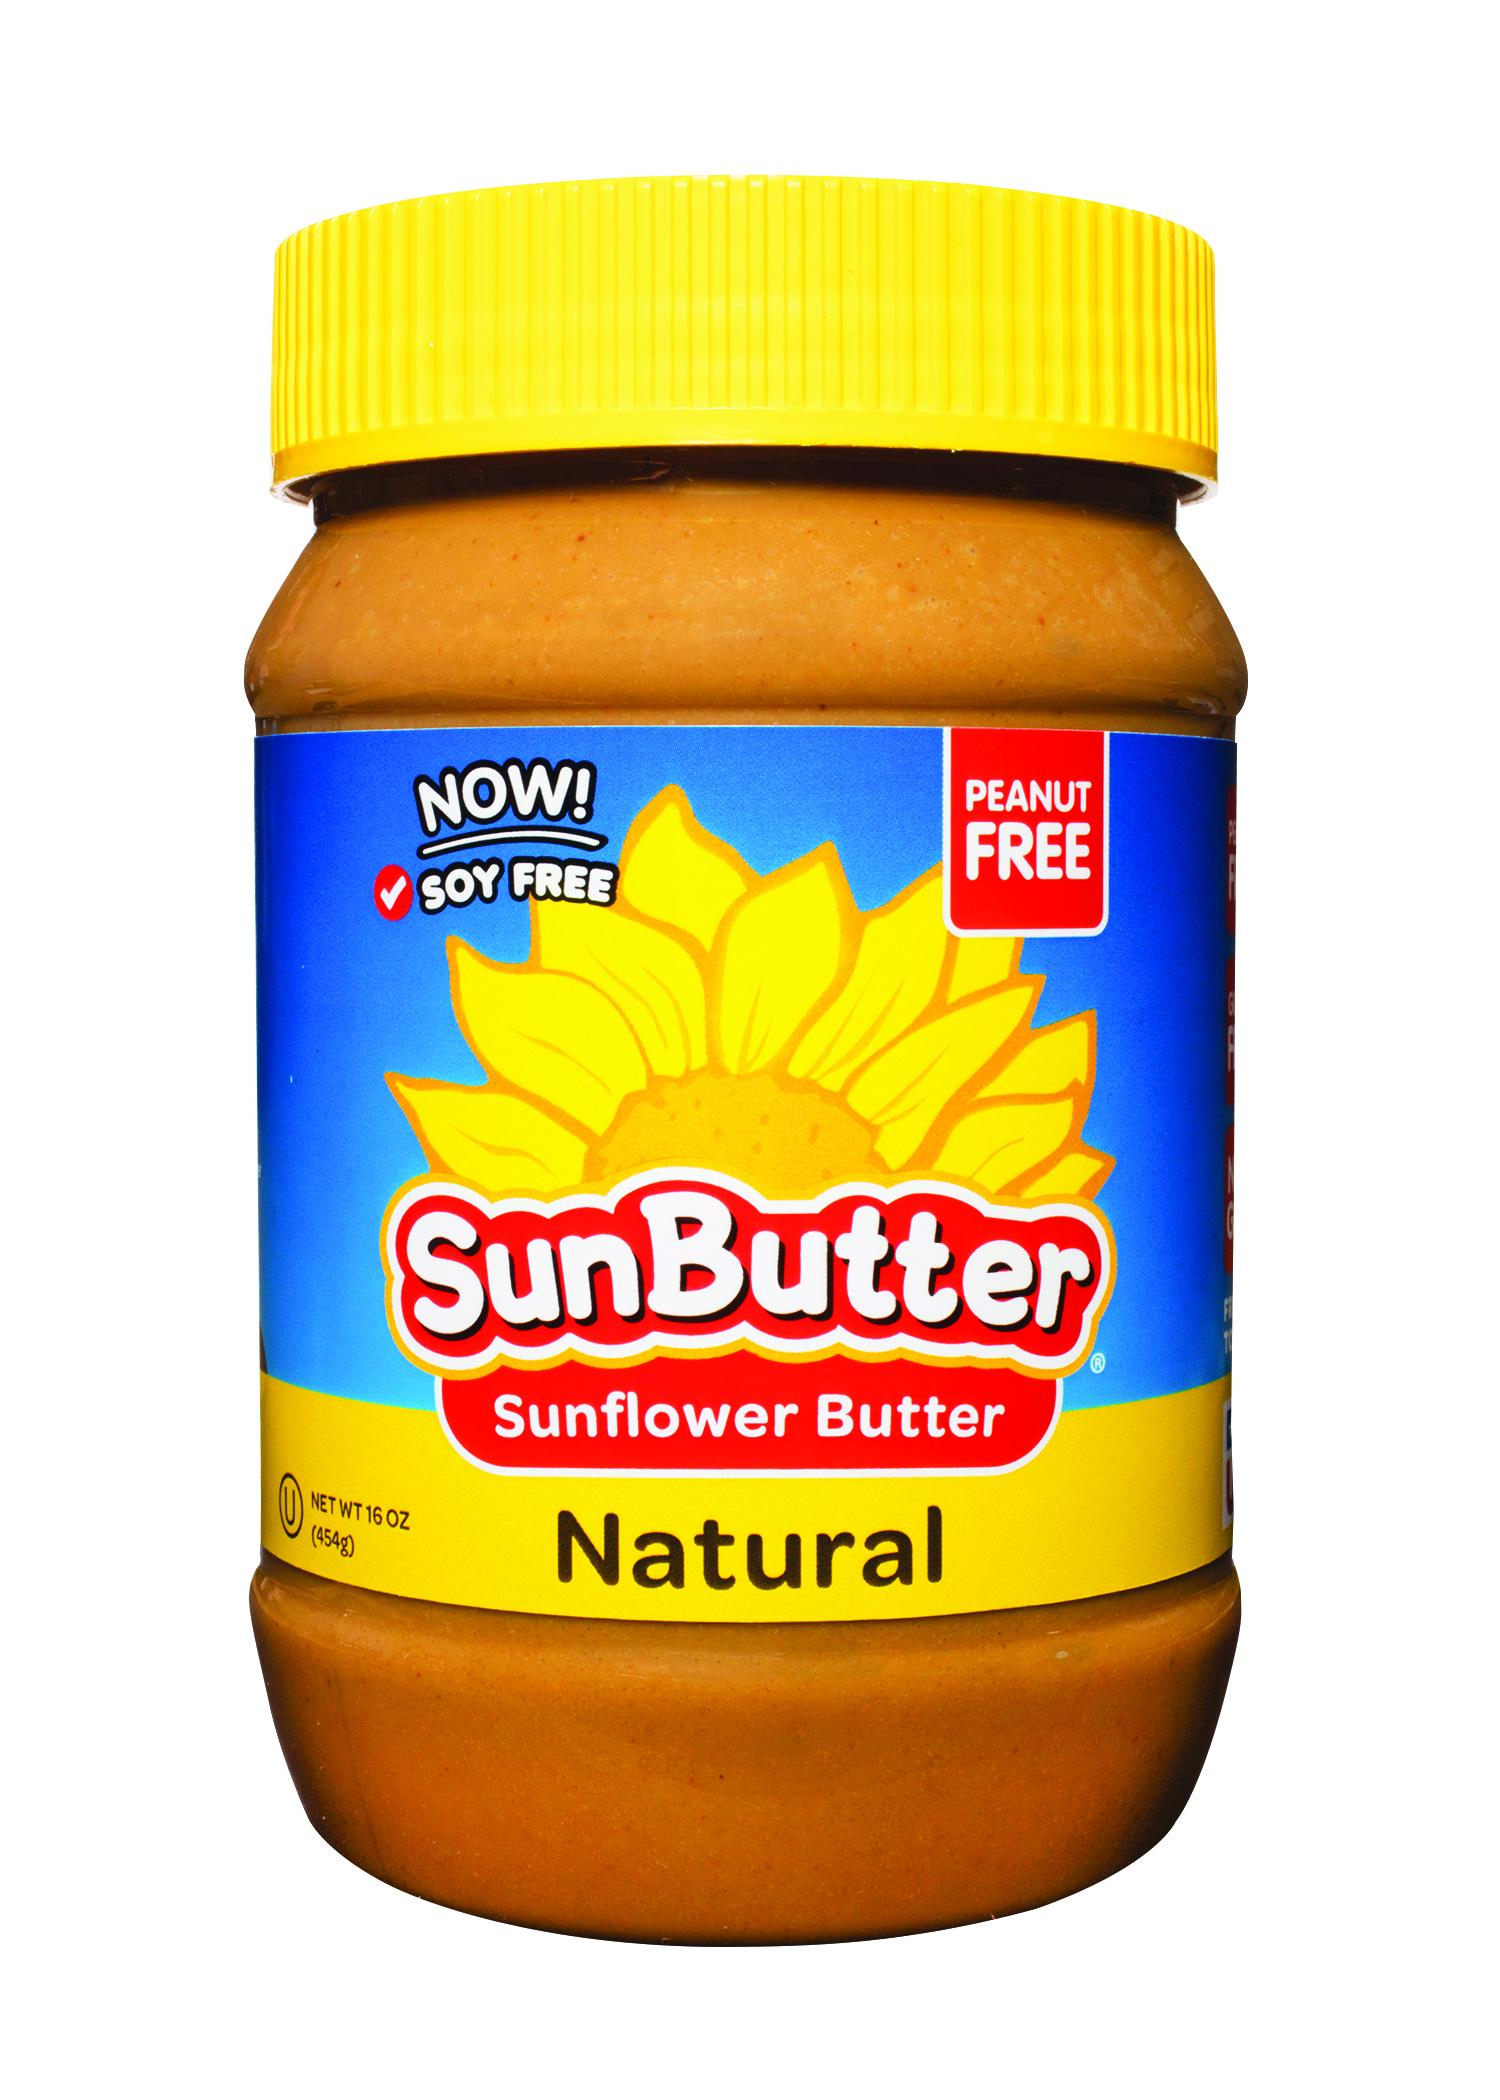 SunButterNatural_5x7CMYK_HighRes